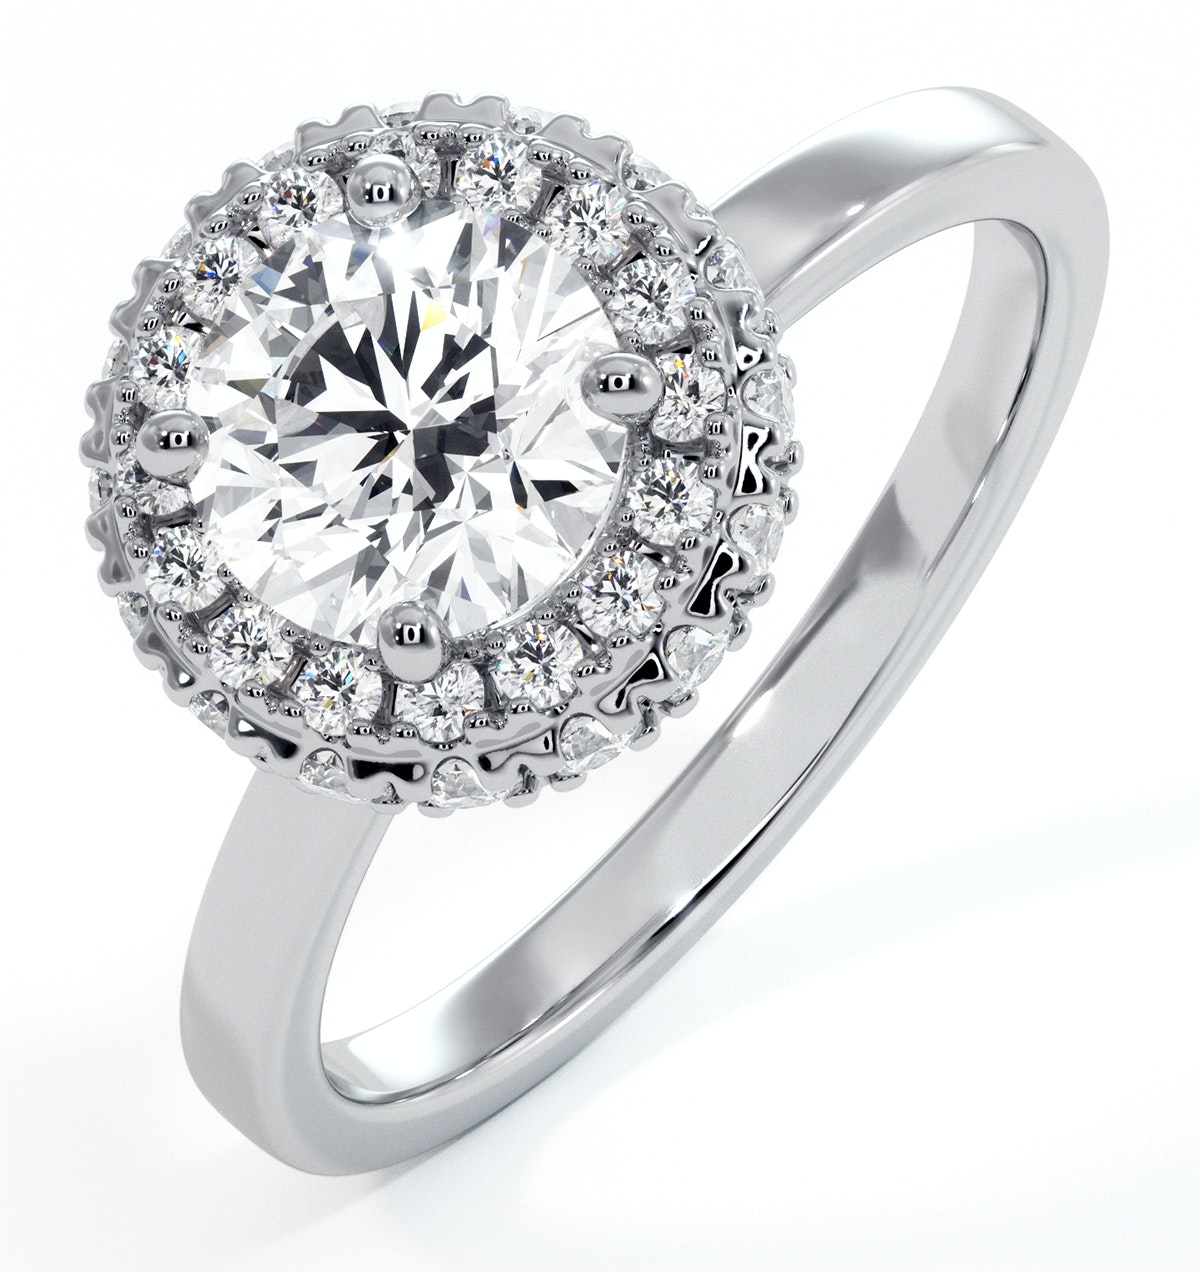 Eleanor GIA Diamond Halo Engagement Ring in Platinum 1.23ct G/VS2